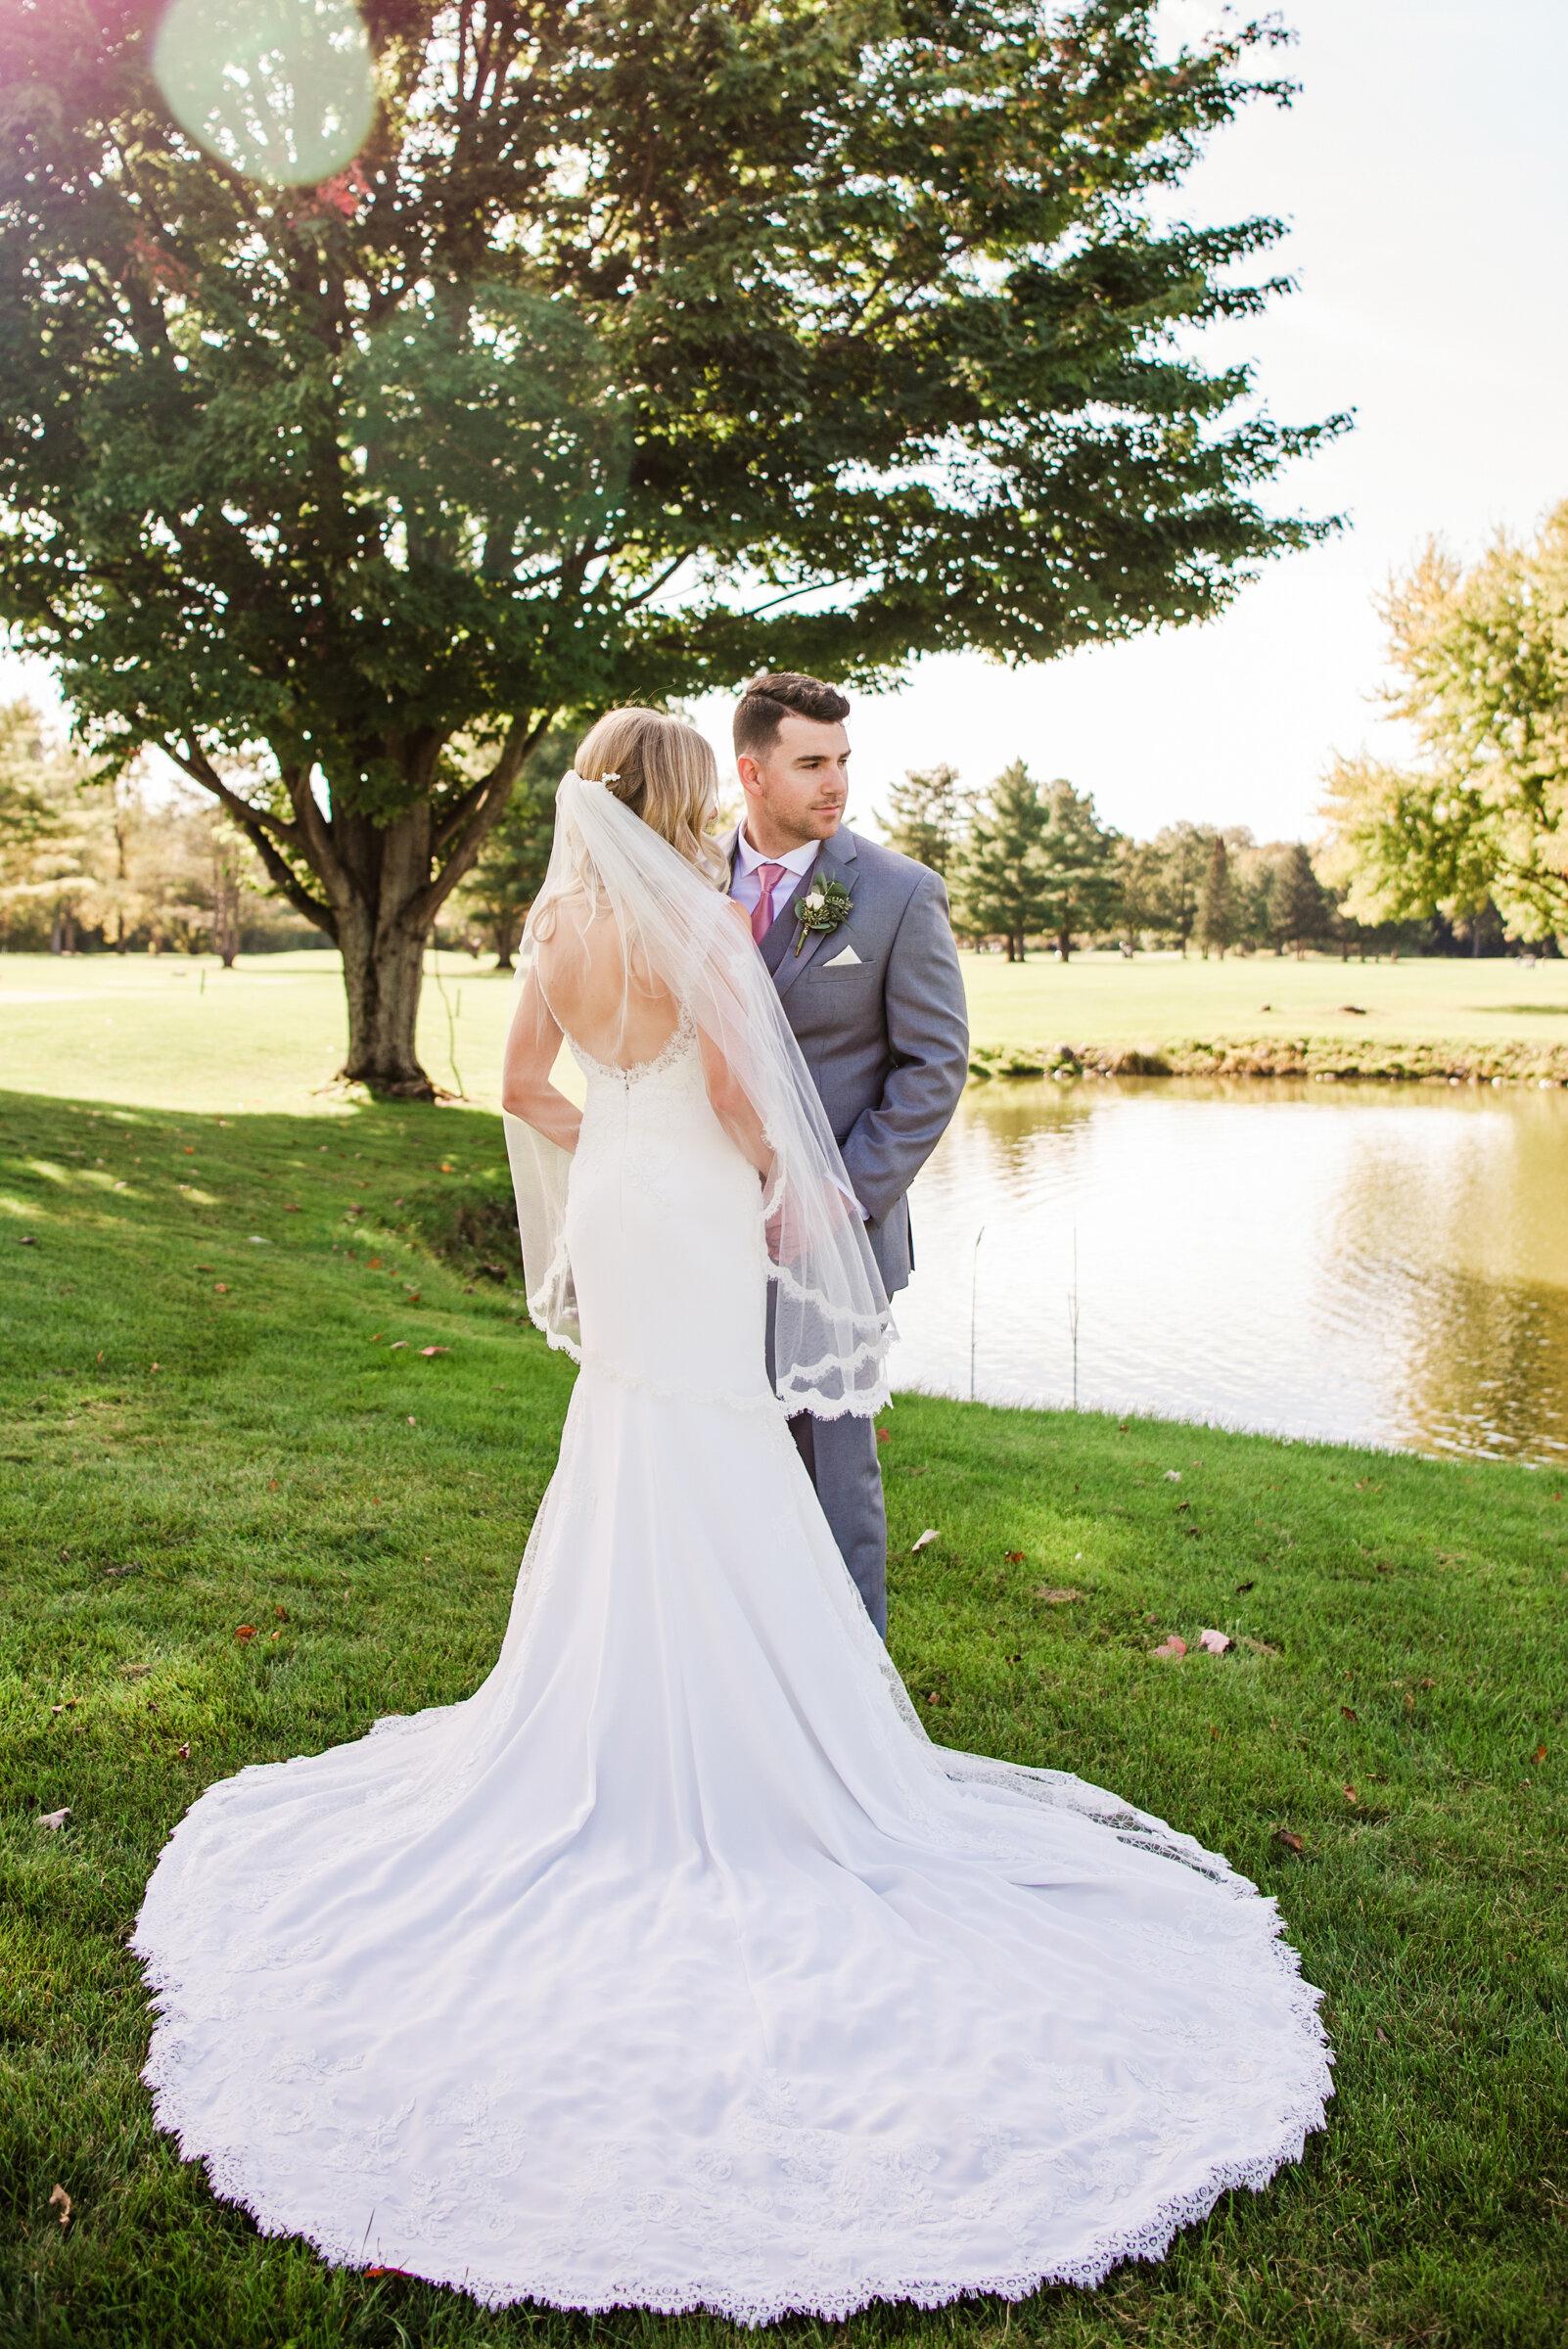 Deerfield_Country_Club_Rochester_Wedding_JILL_STUDIO_Rochester_NY_Photographer_DSC_6480.jpg